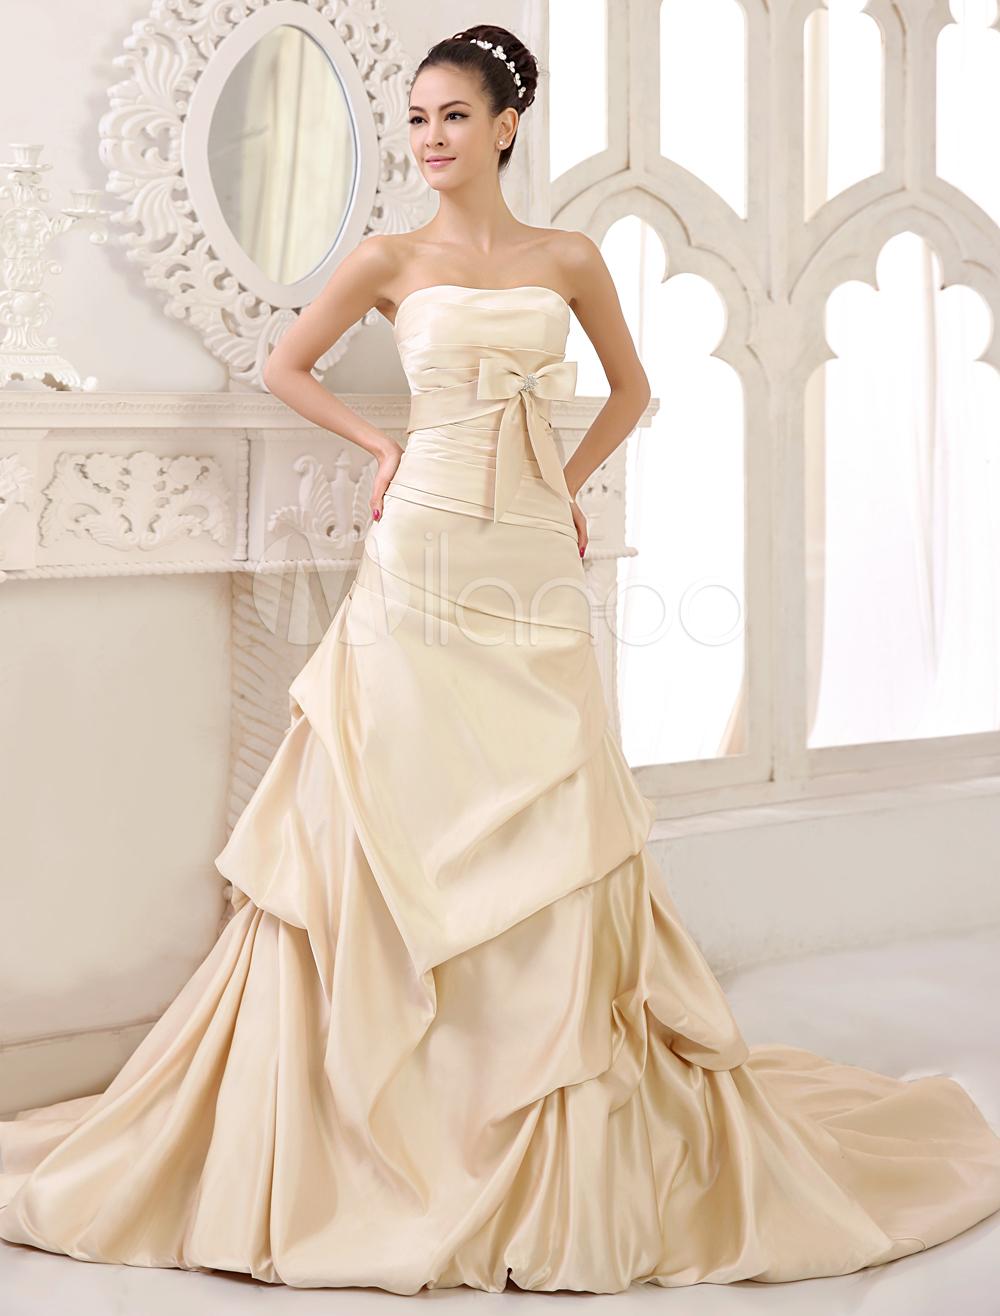 Robe de mariée en satin avec dentelle